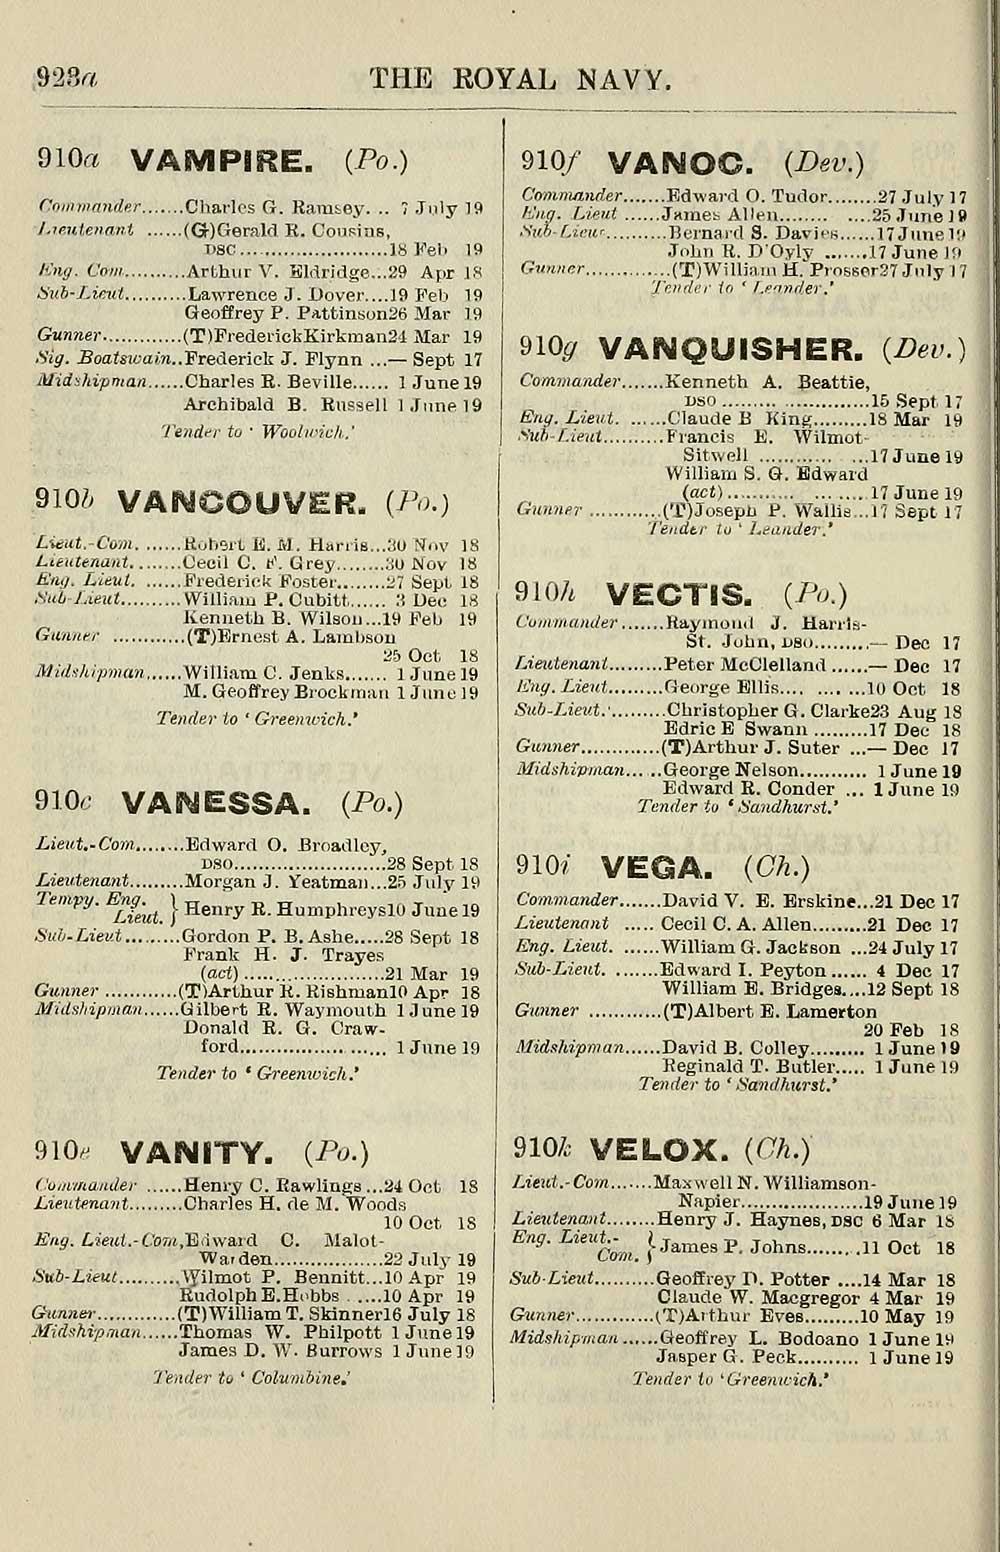 101b3066fd 790) - Navy lists   1913-1914